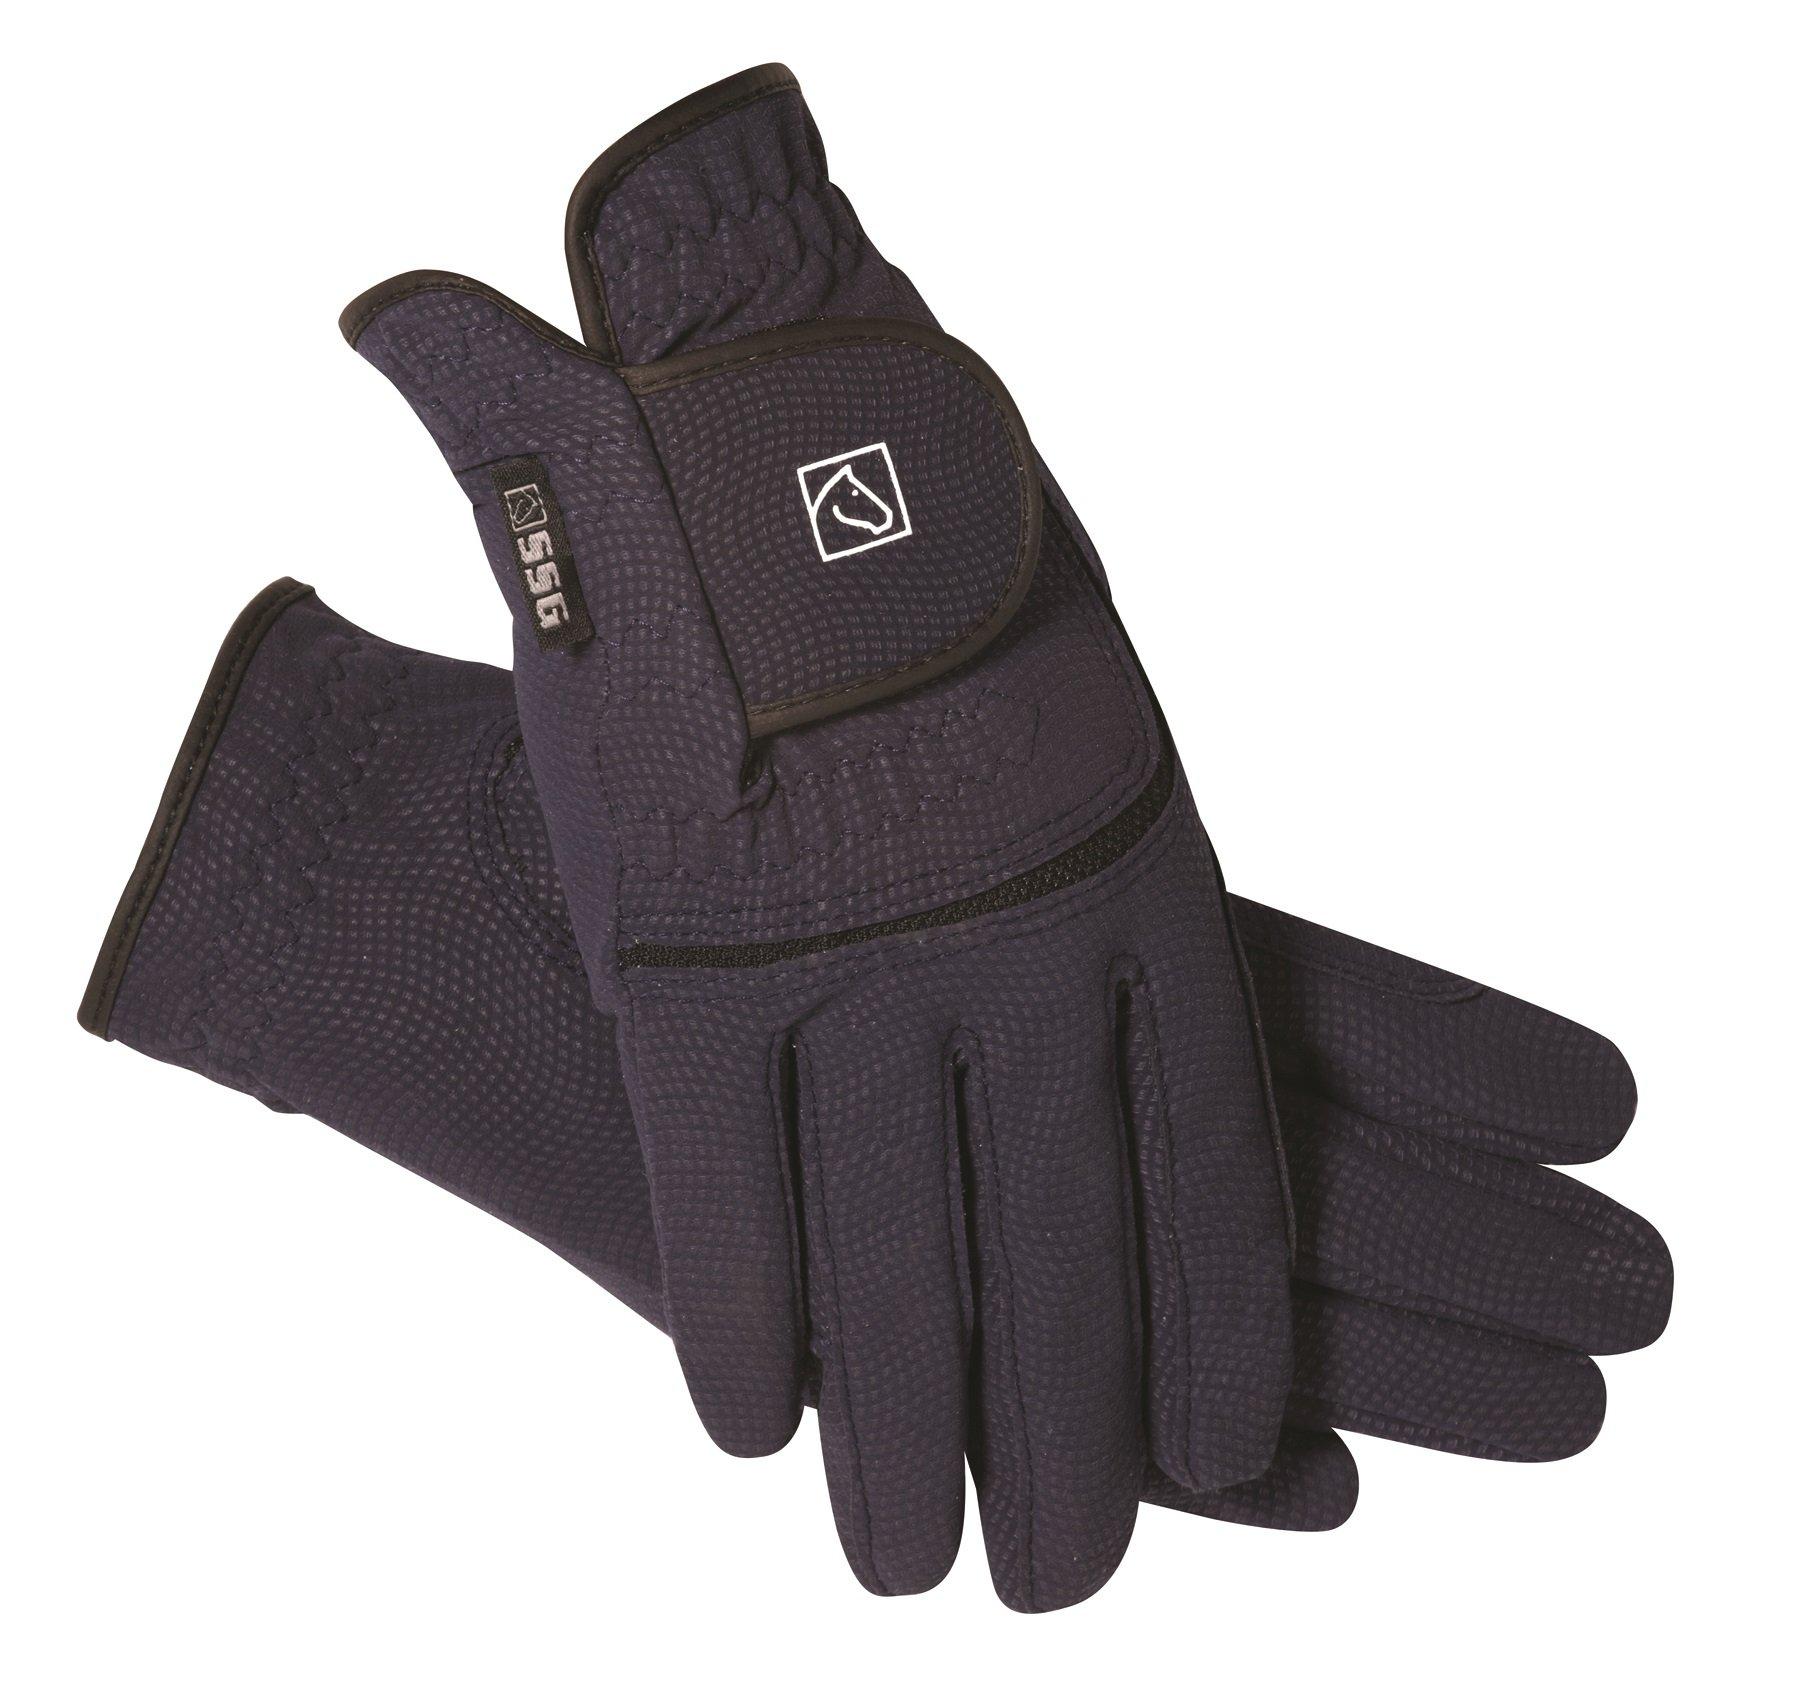 SSG Digital Riding Glove - NAVY.5